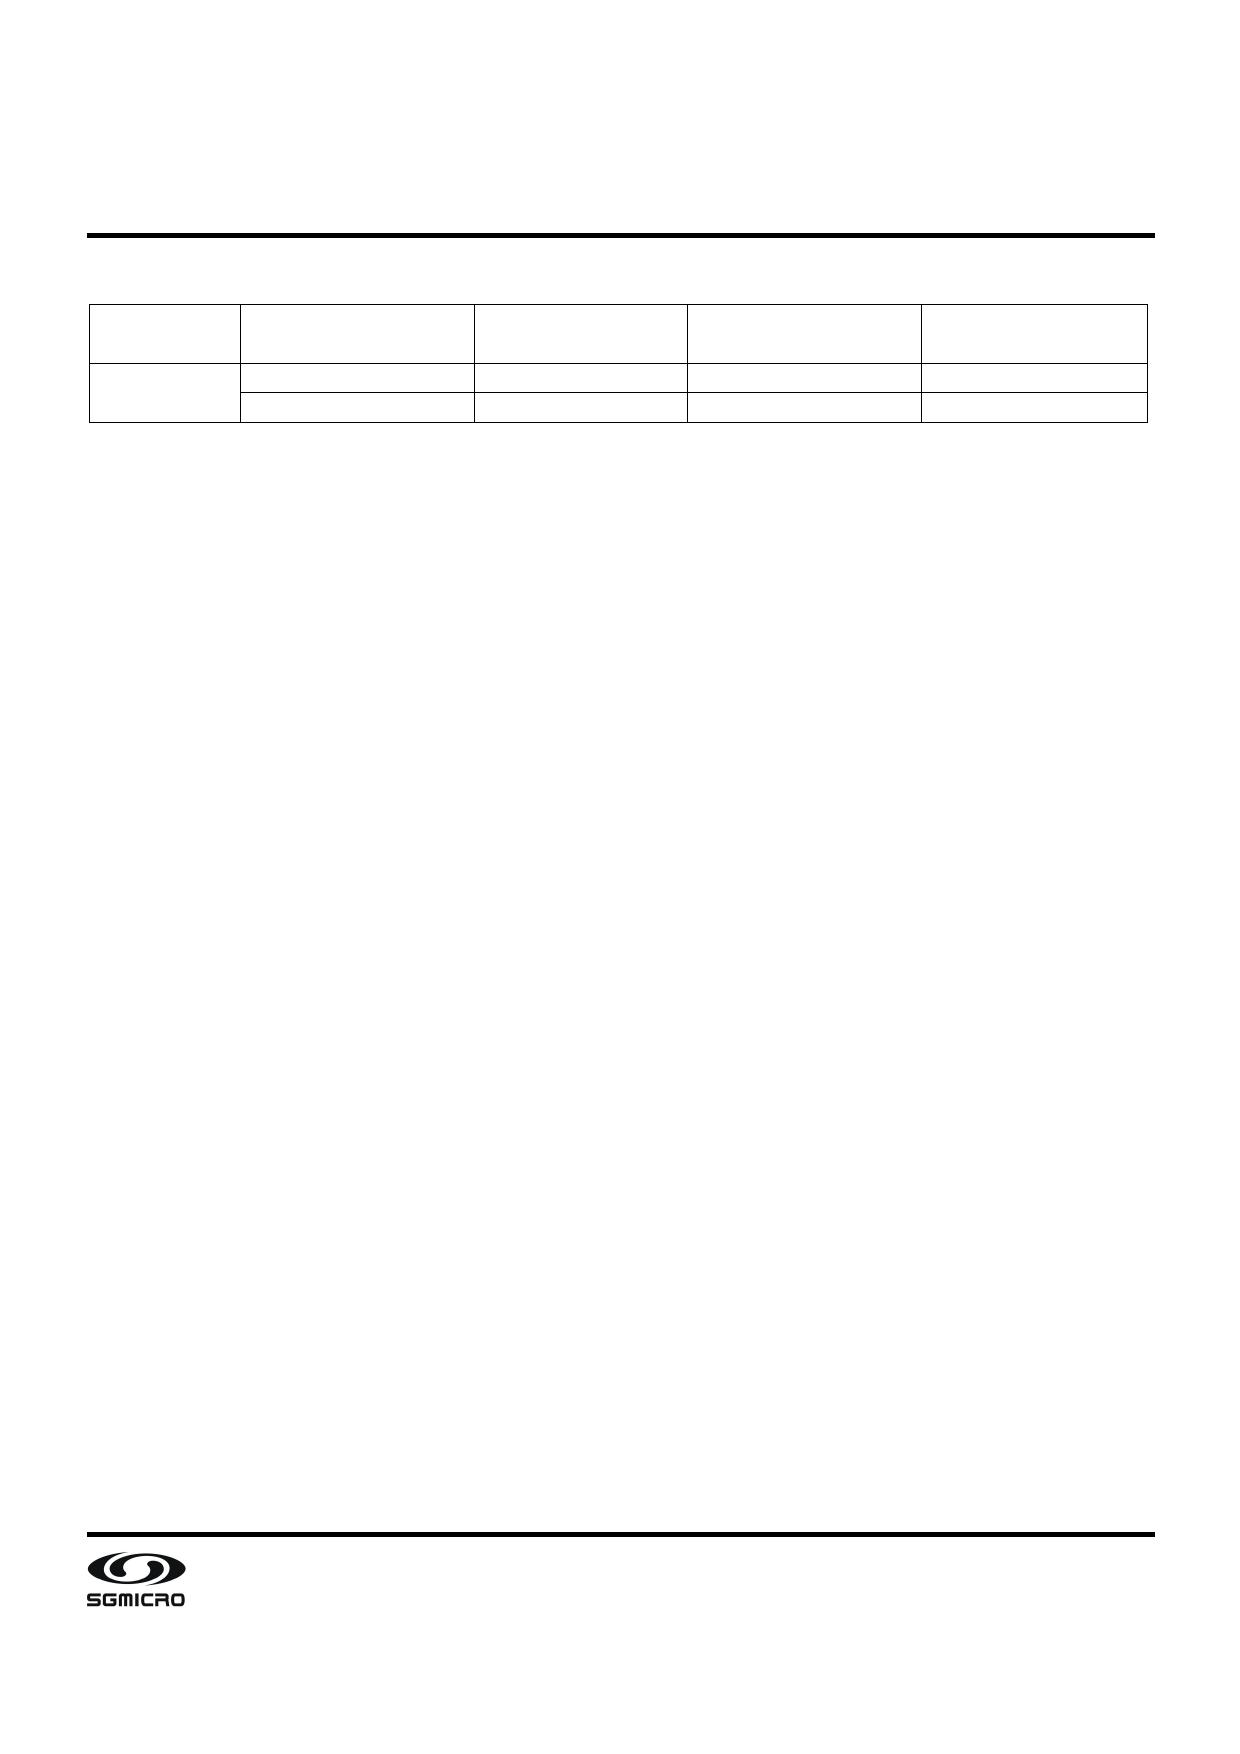 SGM8582 pdf, schematic